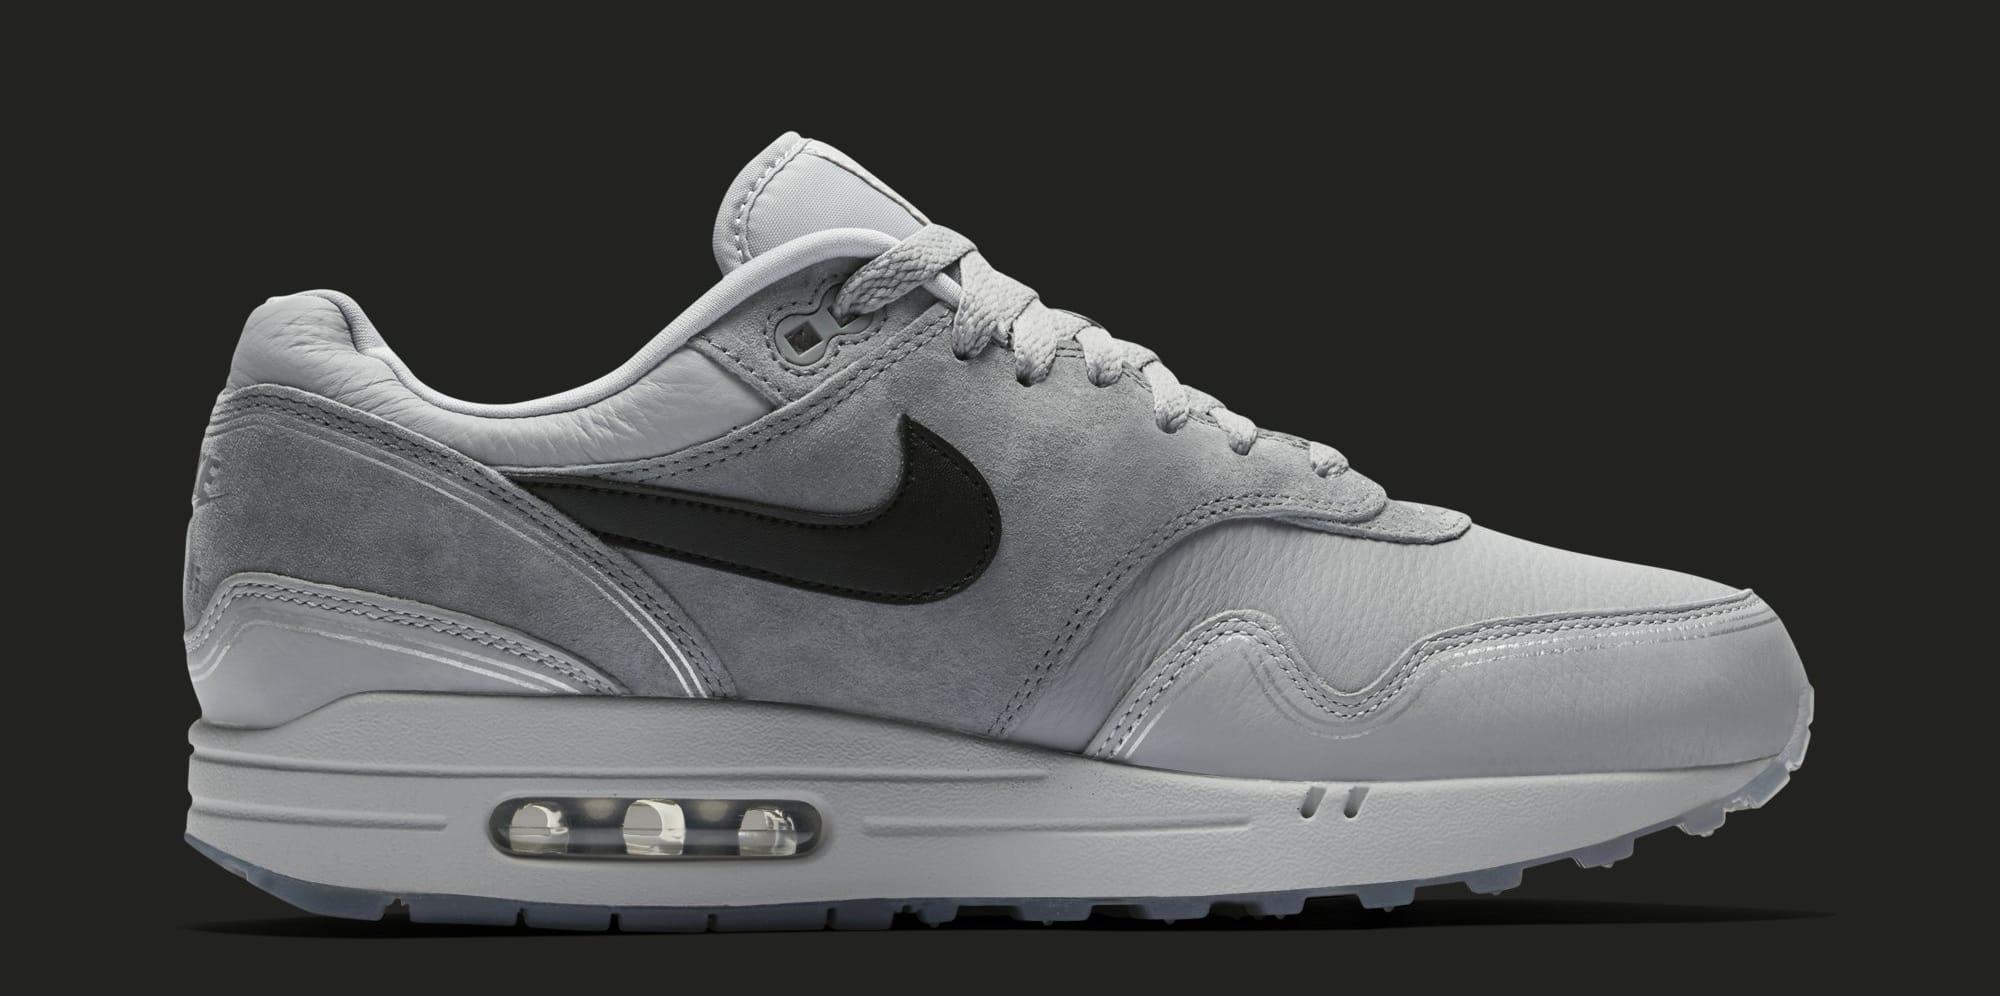 best service 85ade 53b06 Image via Nike Nike Air Max 1  Centre Pompidou  Wolf Grey AV3735-001  (Medial)